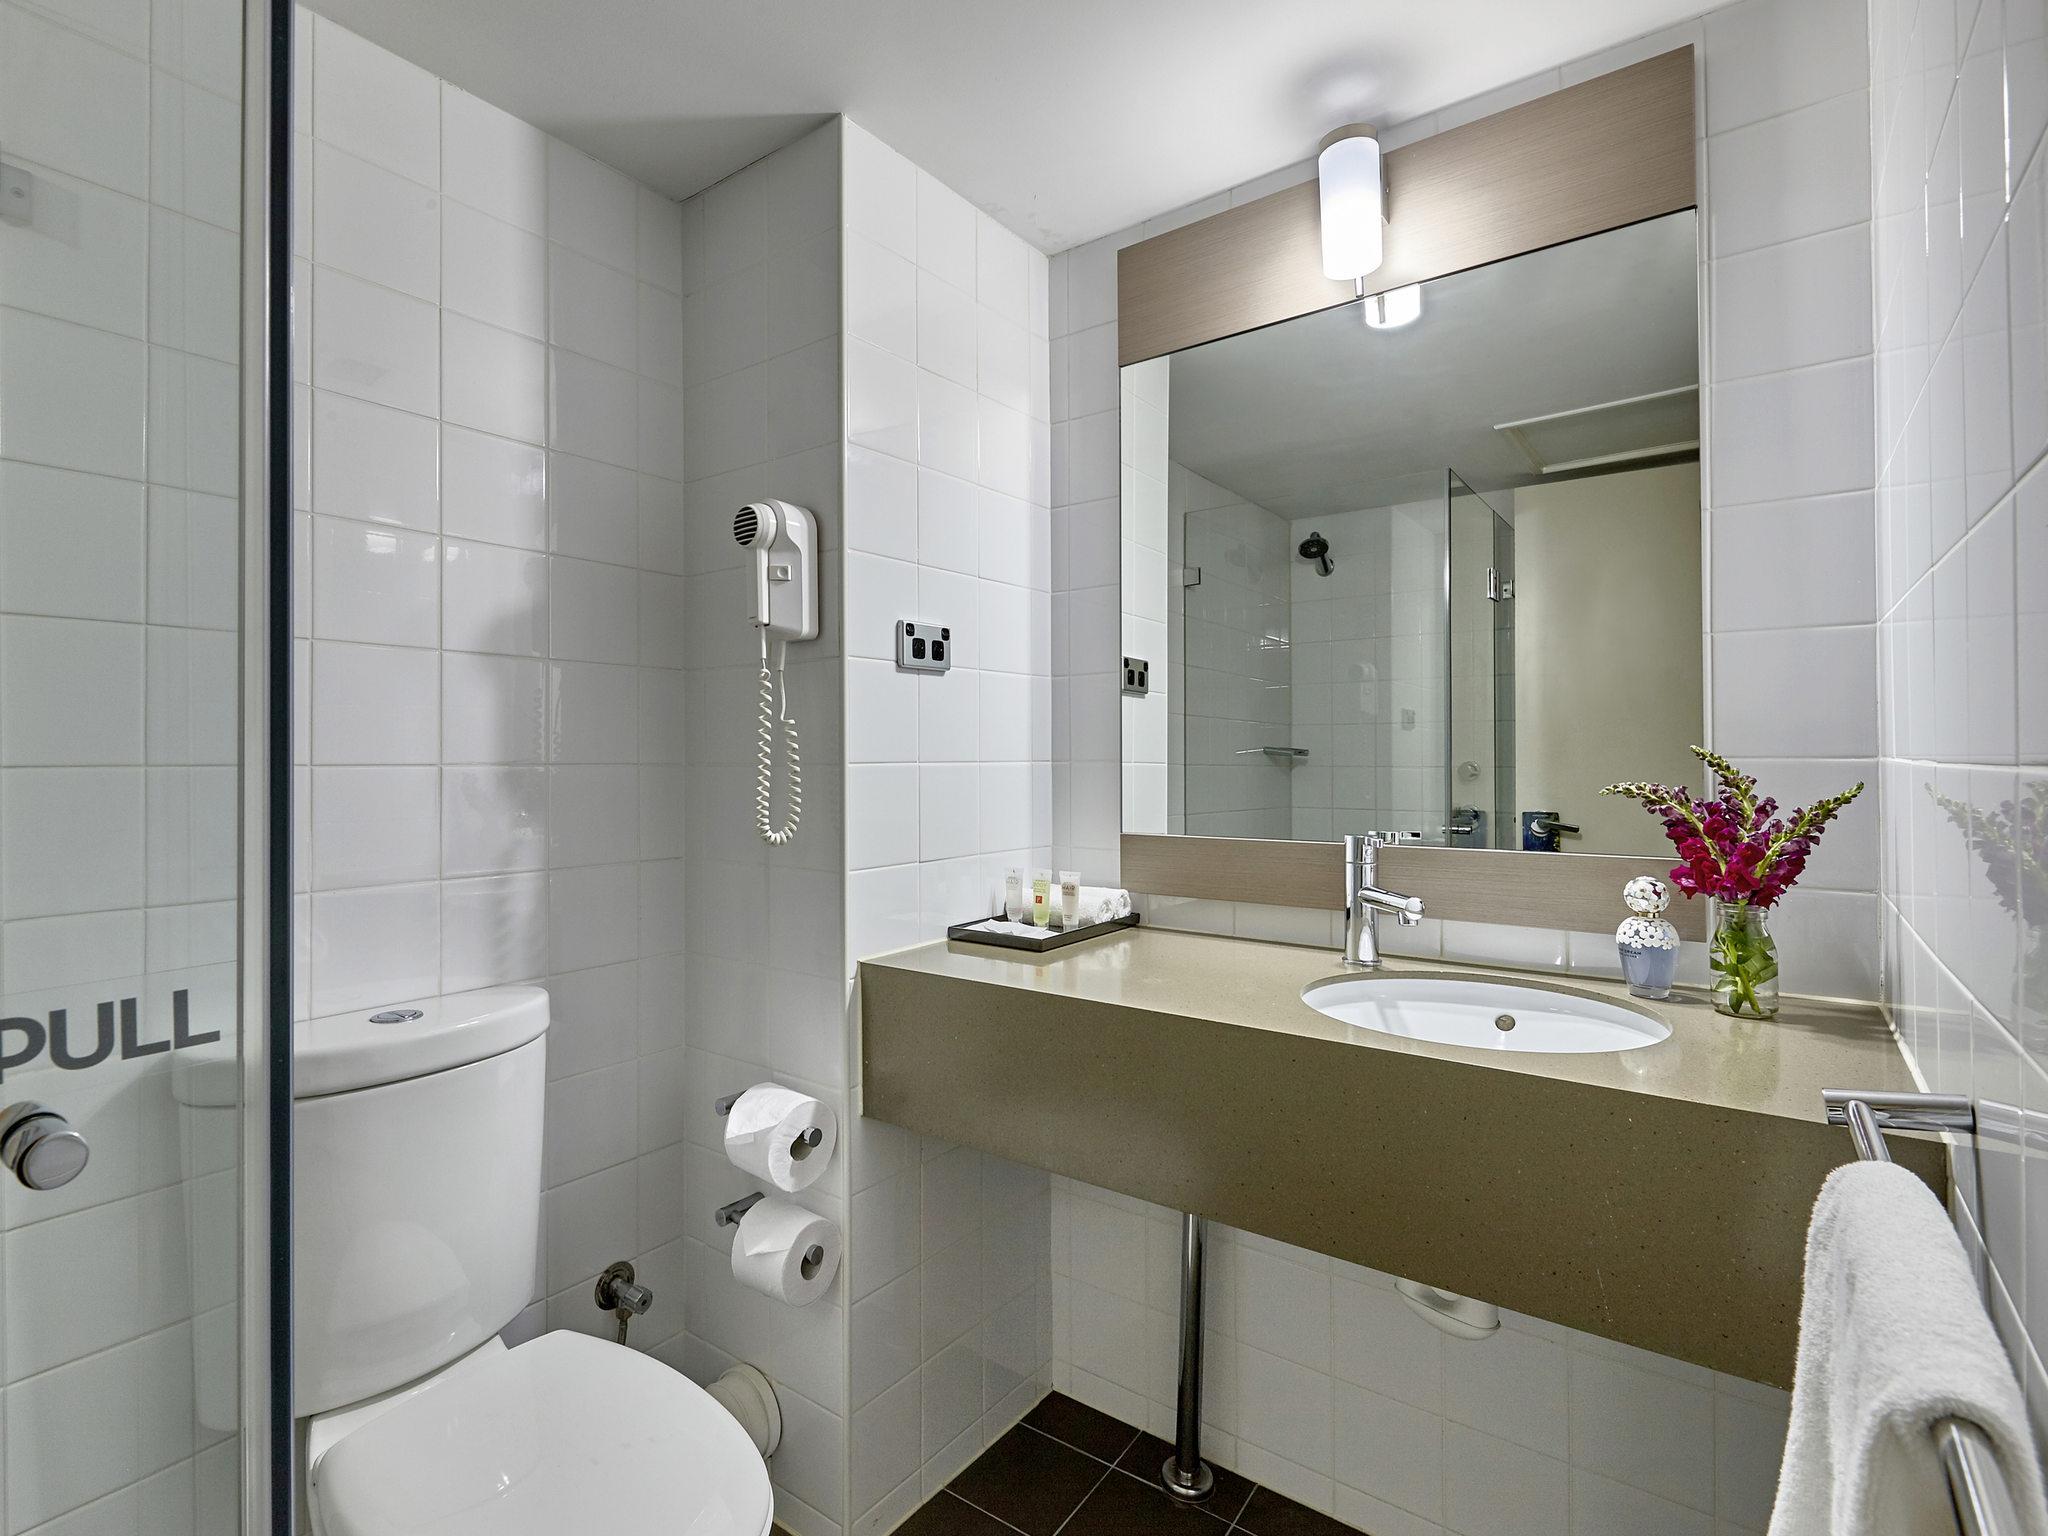 bathroom accessories perth scotland. rooms - ibis perth bathroom accessories scotland